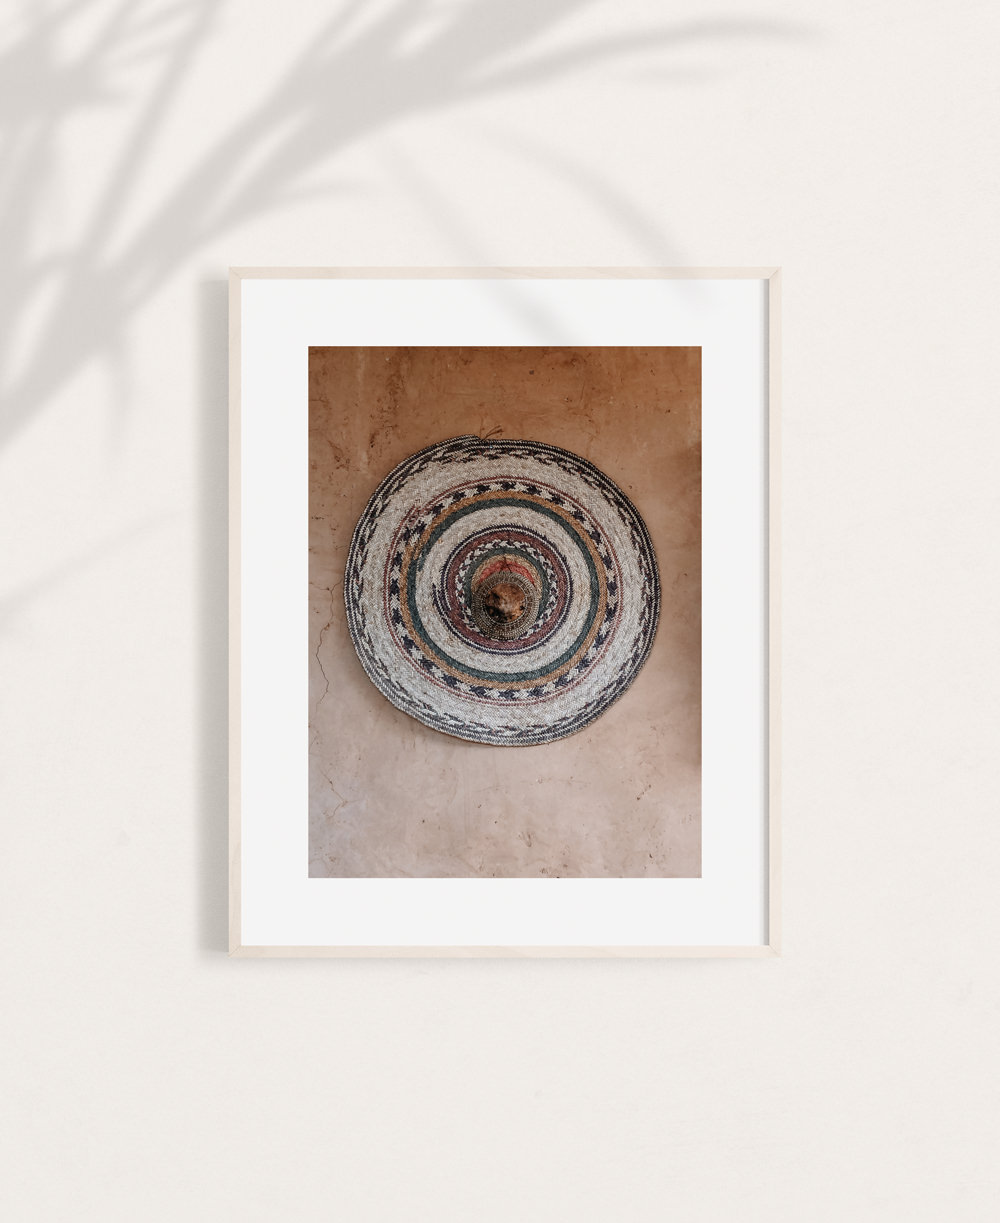 nicischwab-prints-001-oman